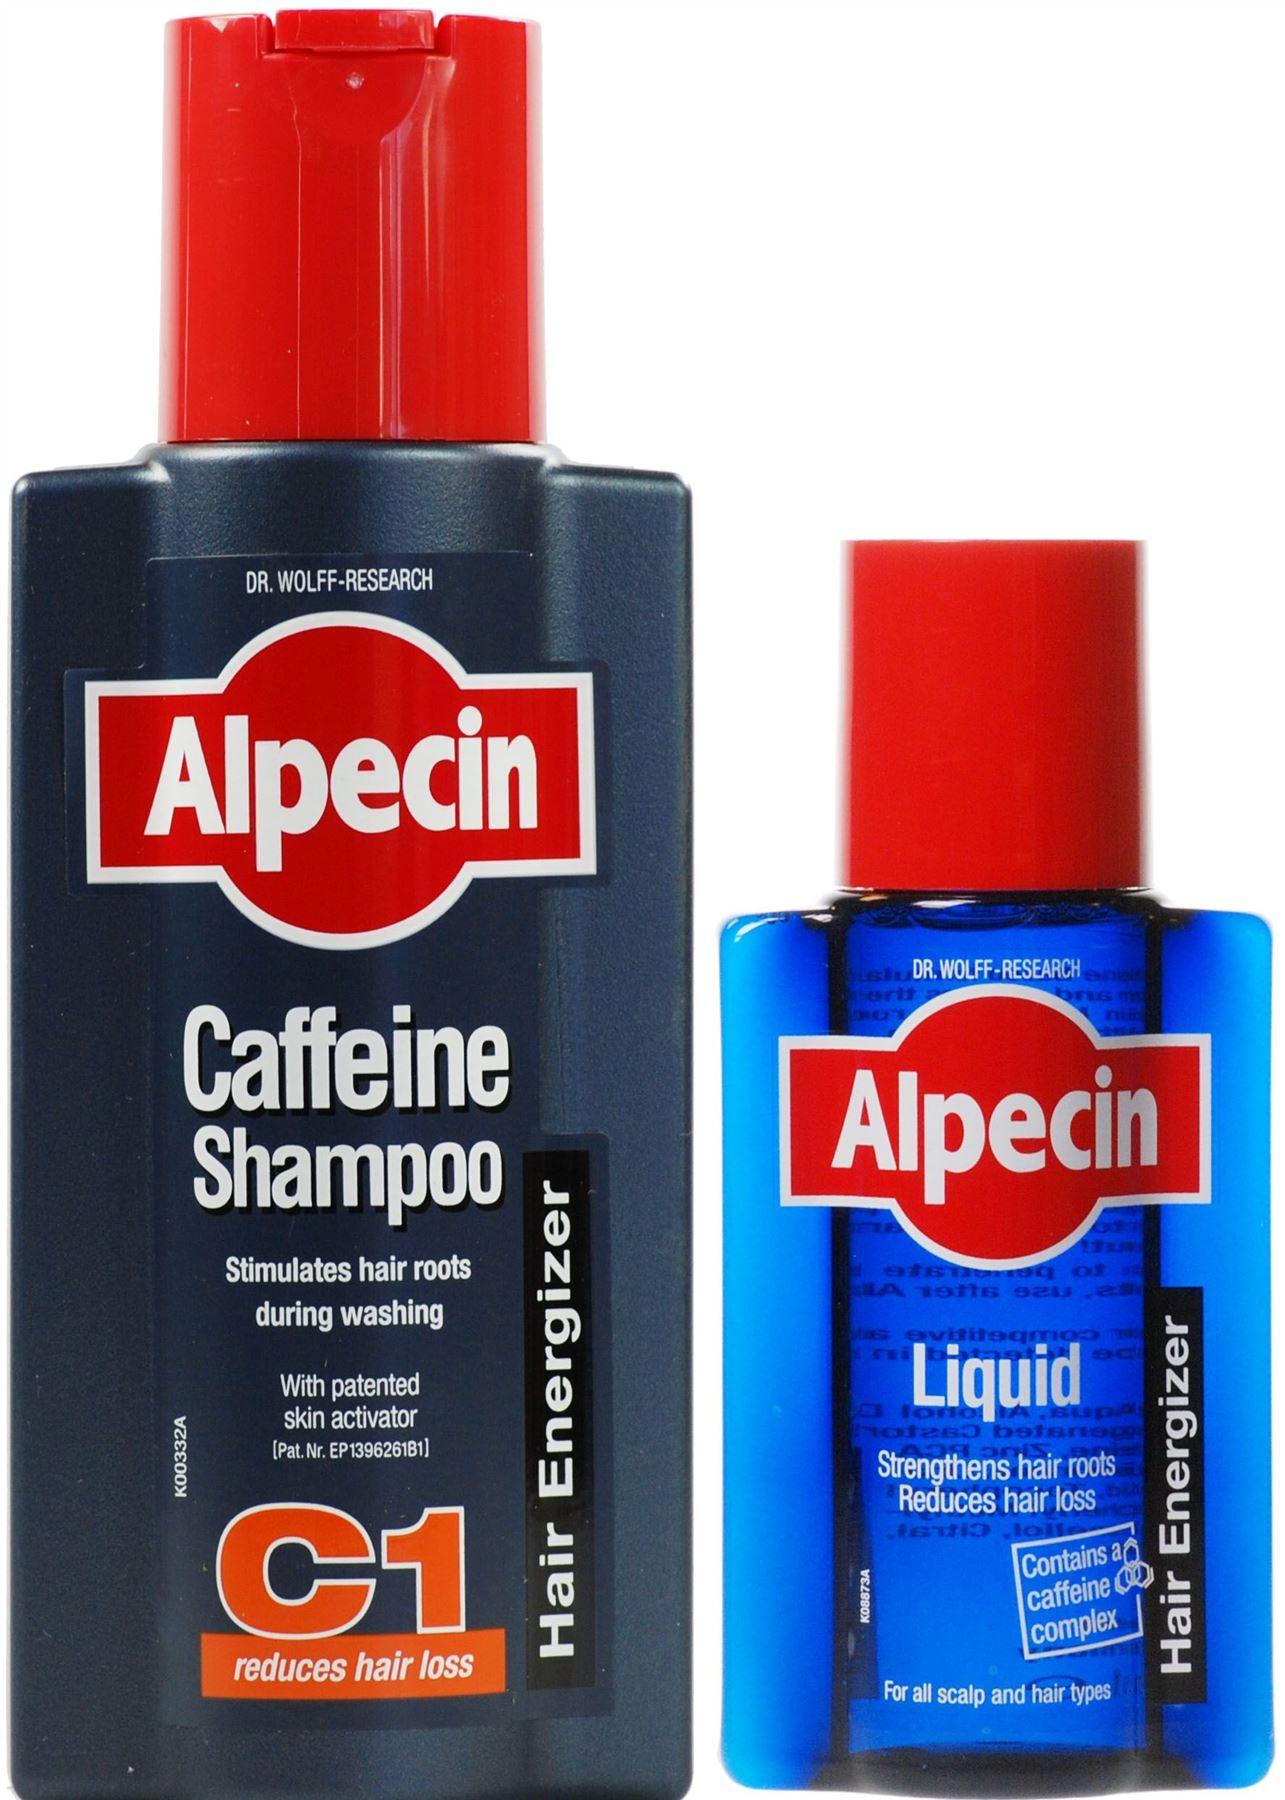 Alpecin Caffeine Shampoo 250ml And Alpecin After Shampoo